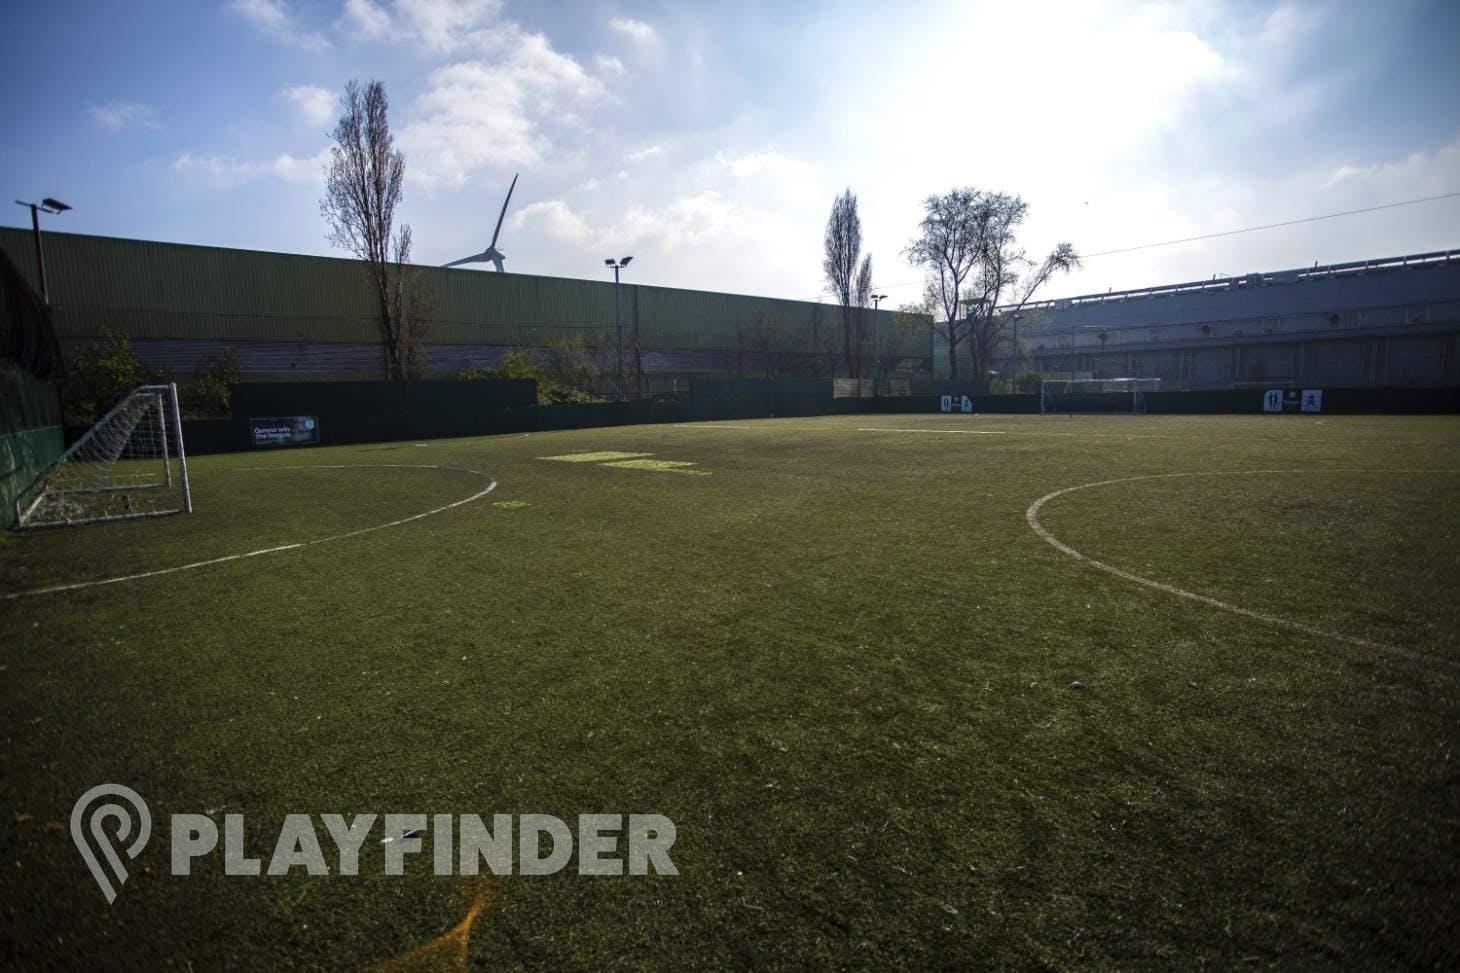 Powerleague Gateshead 7 a side   3G Astroturf football pitch